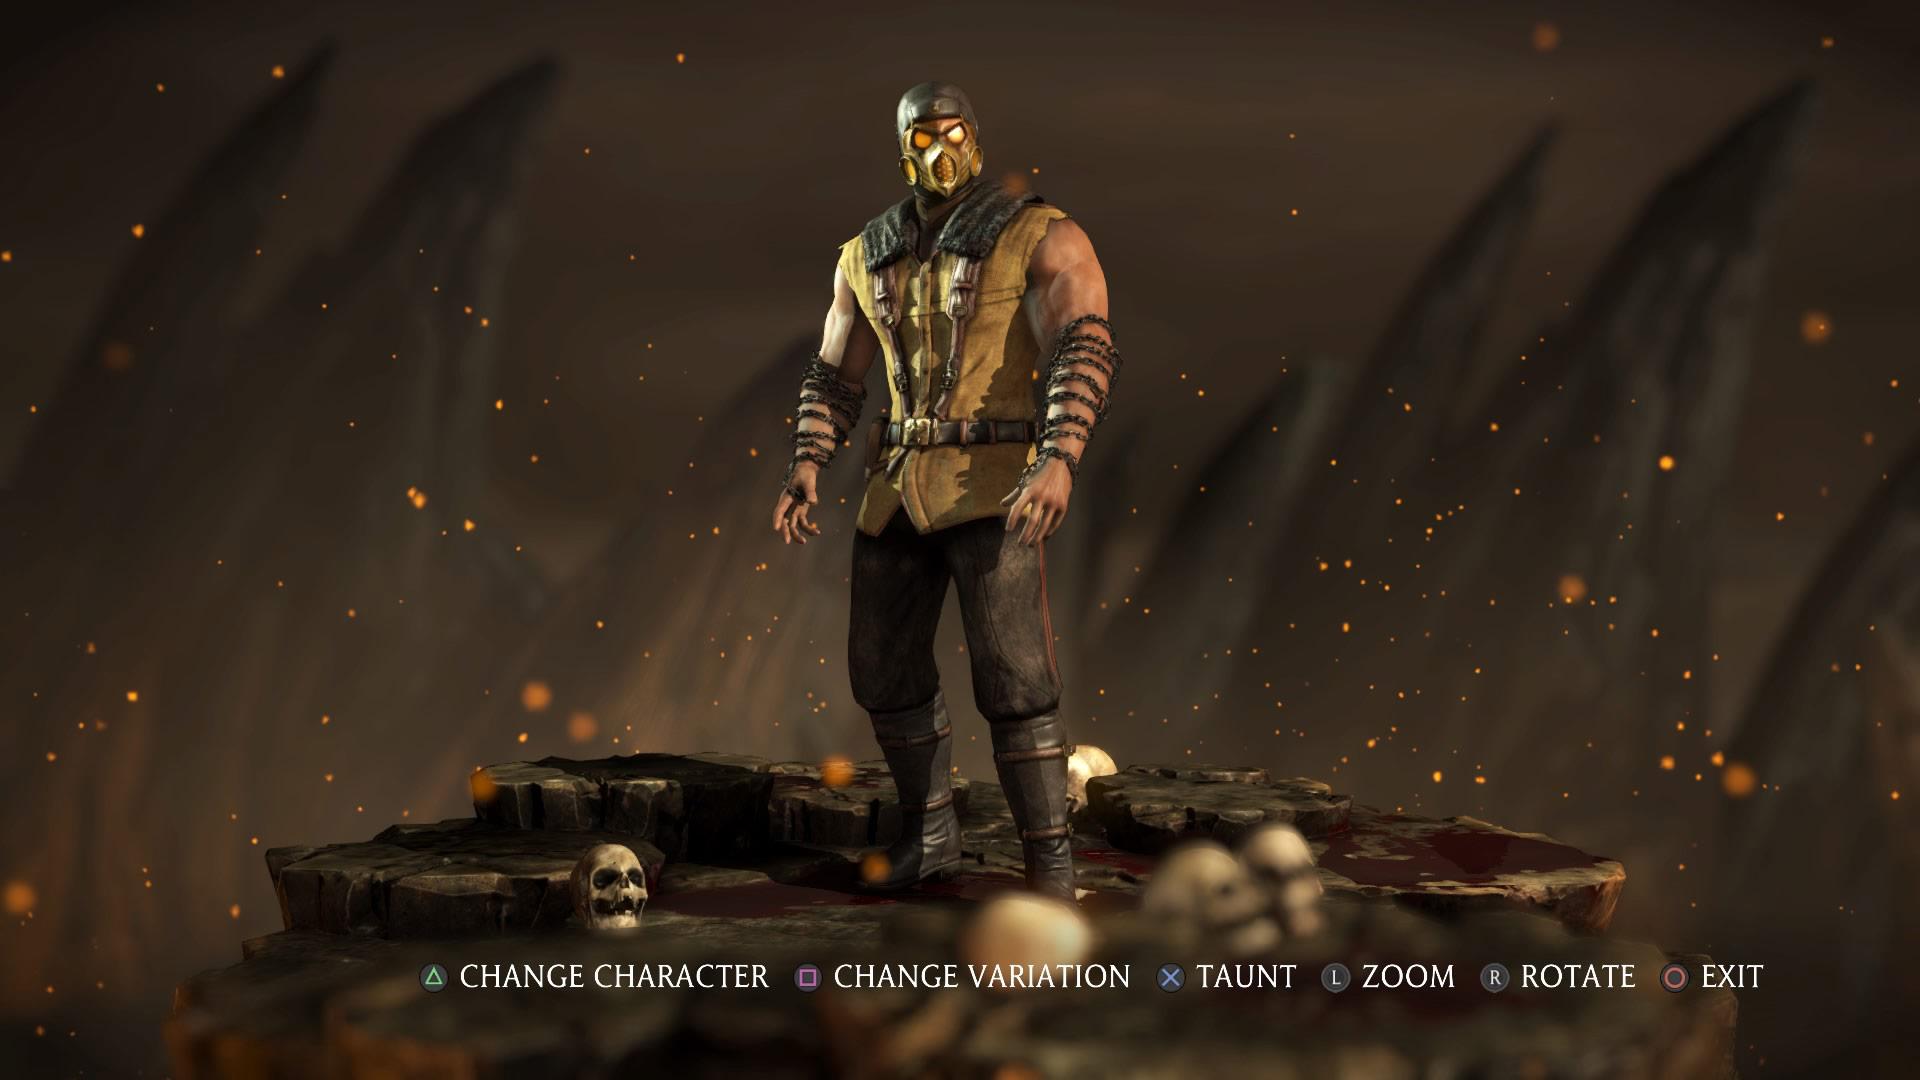 Mortal Kombat XL Kombat Pack 2  11 out of 14 image gallery